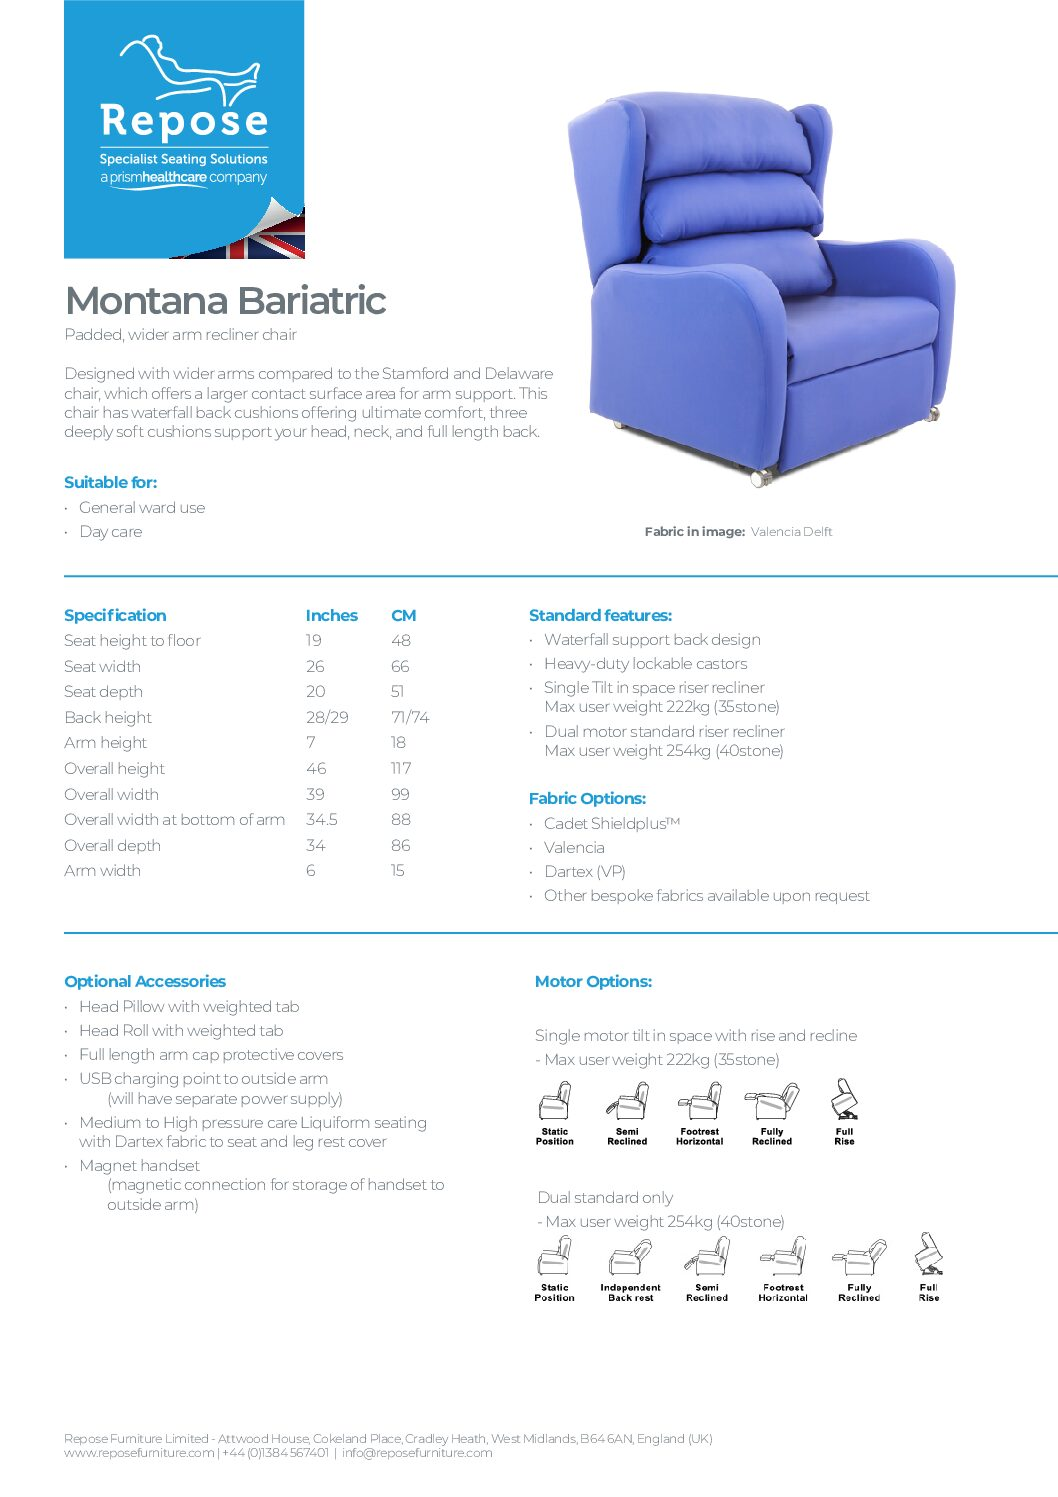 PDF specification Montana Bariatric v7 1 pdf Repose Furniture Downloads and Brochure Request